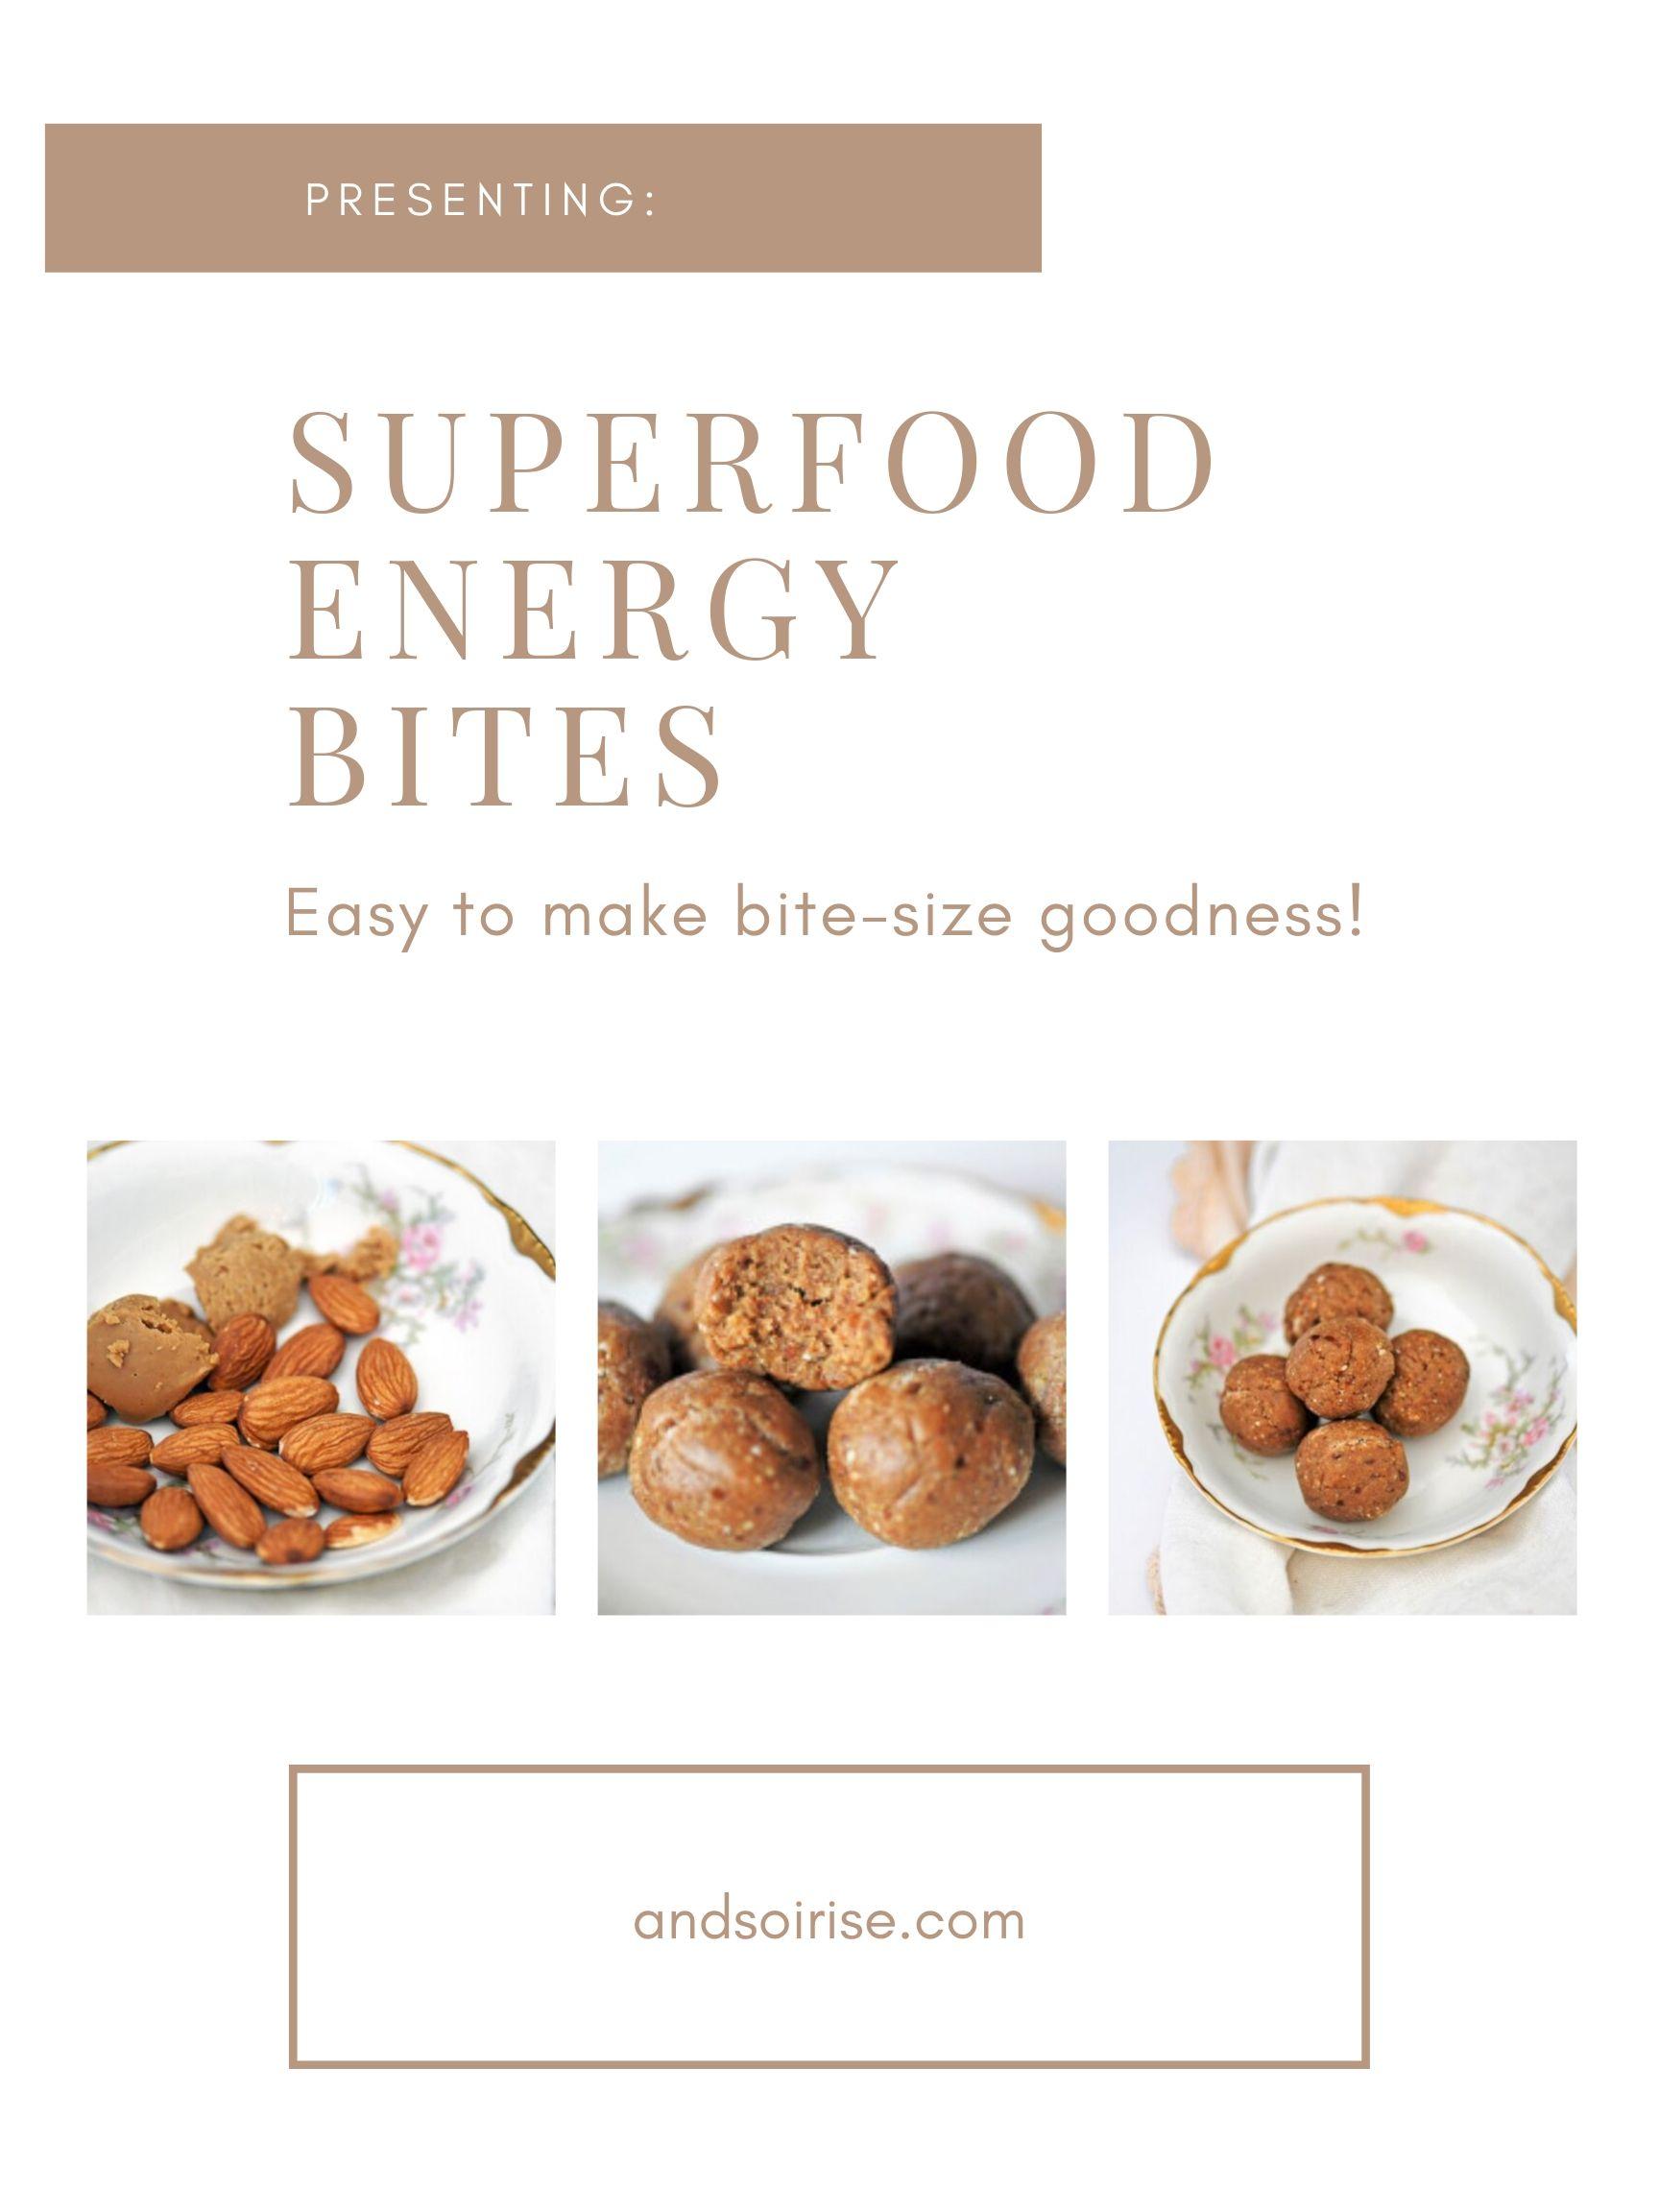 & so I Rise presents superfood energy bites.jpg